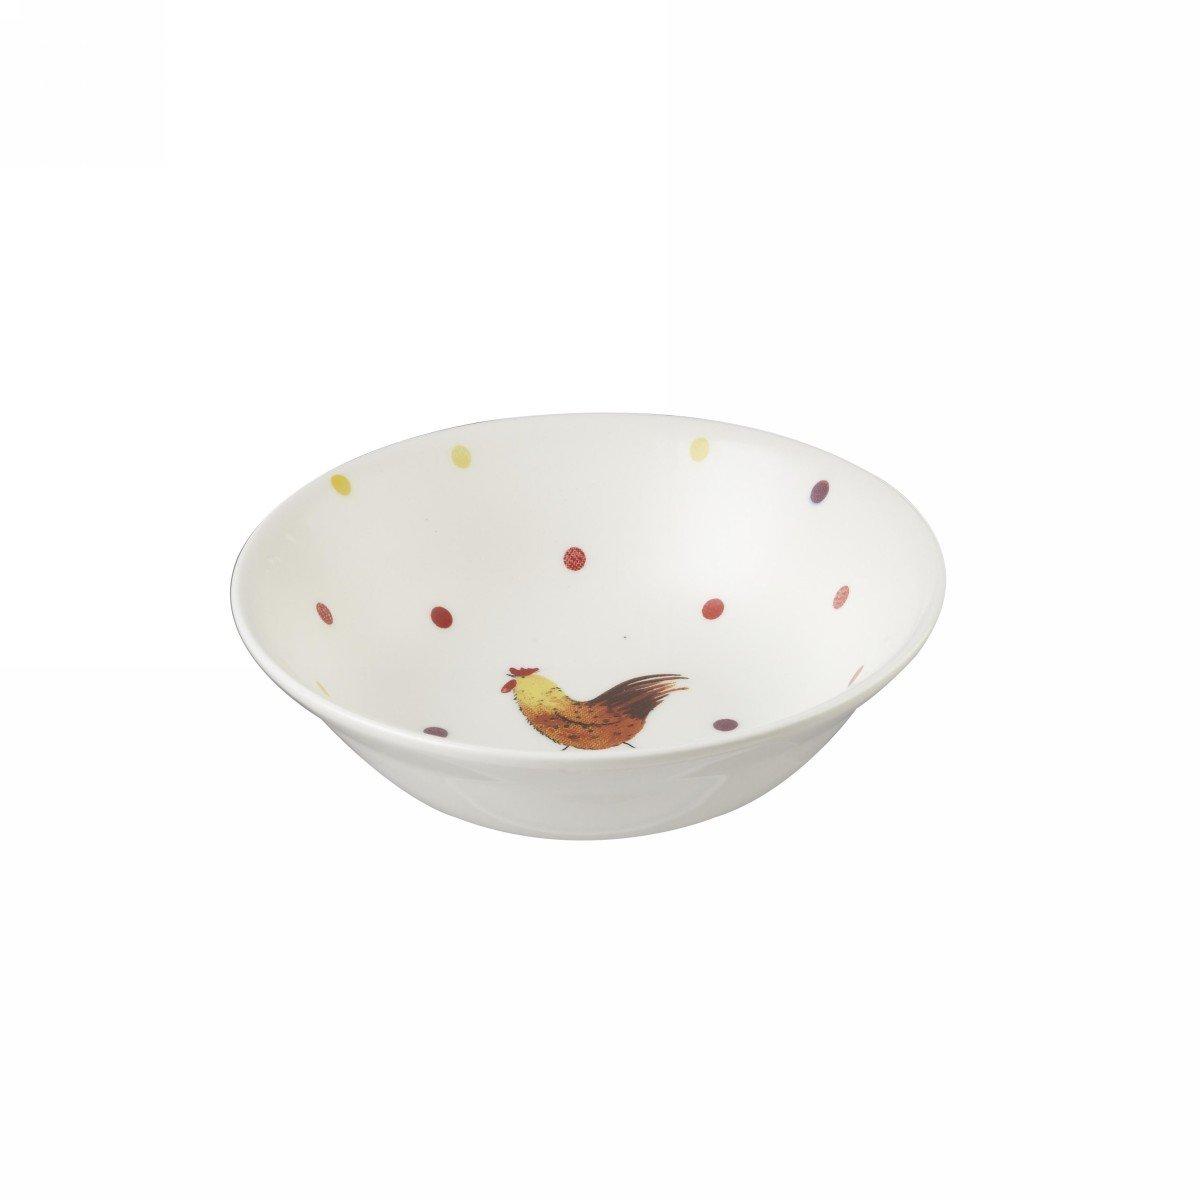 Тарелка для каши 15,5 см Churchill Петухи от Алекс Кларк